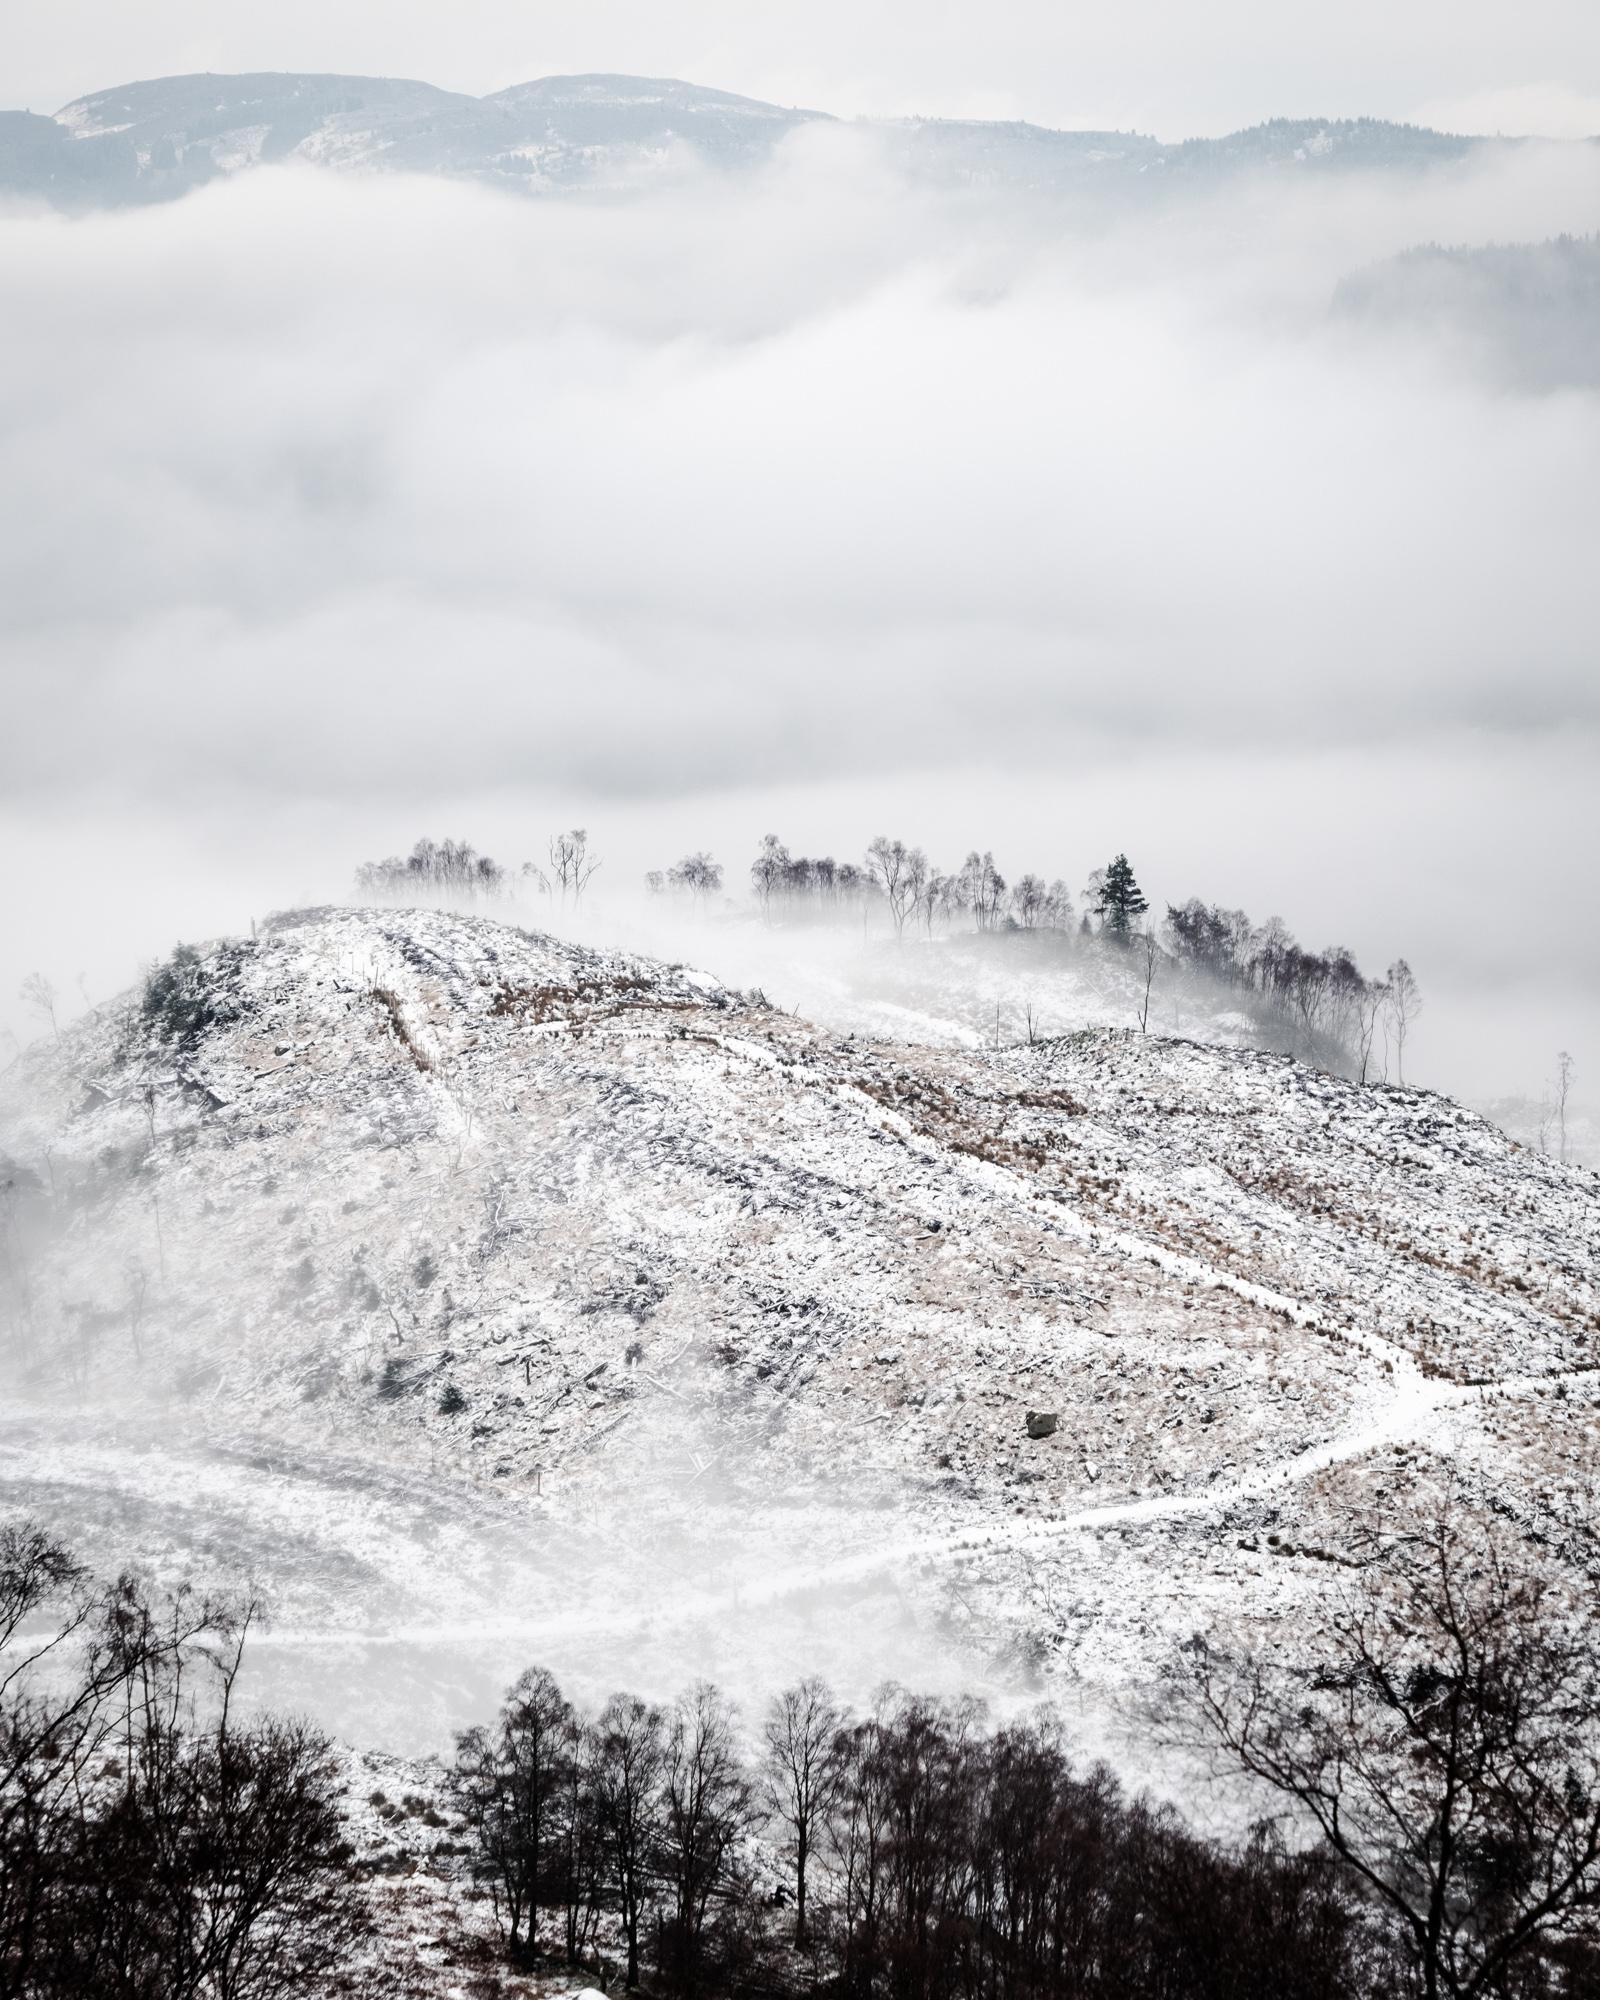 The mystical fog